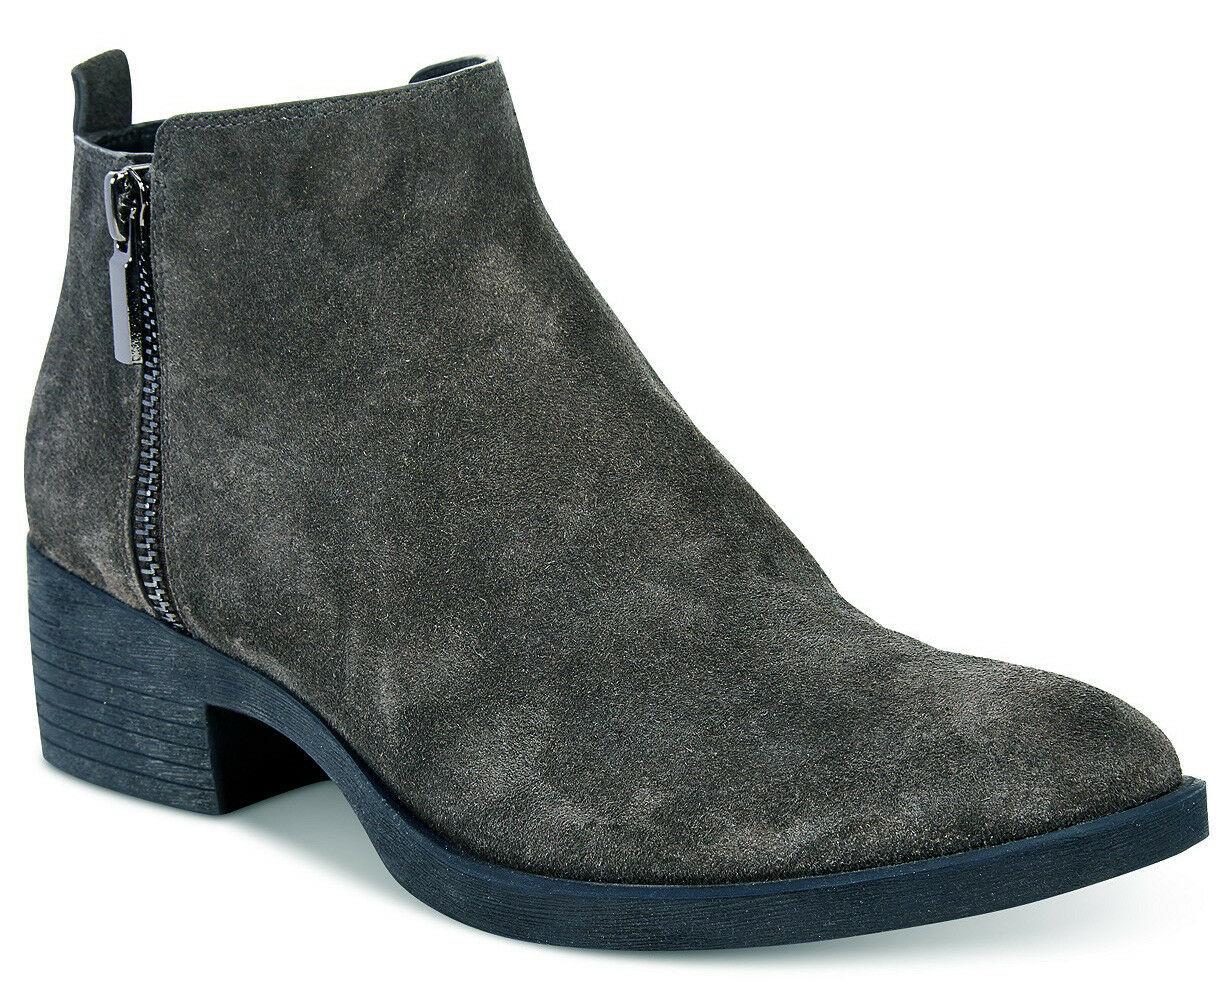 NIB Brand New Ladies Kenneth Cole Levon Asphalt Grey Leather/Suede Ankle Boots